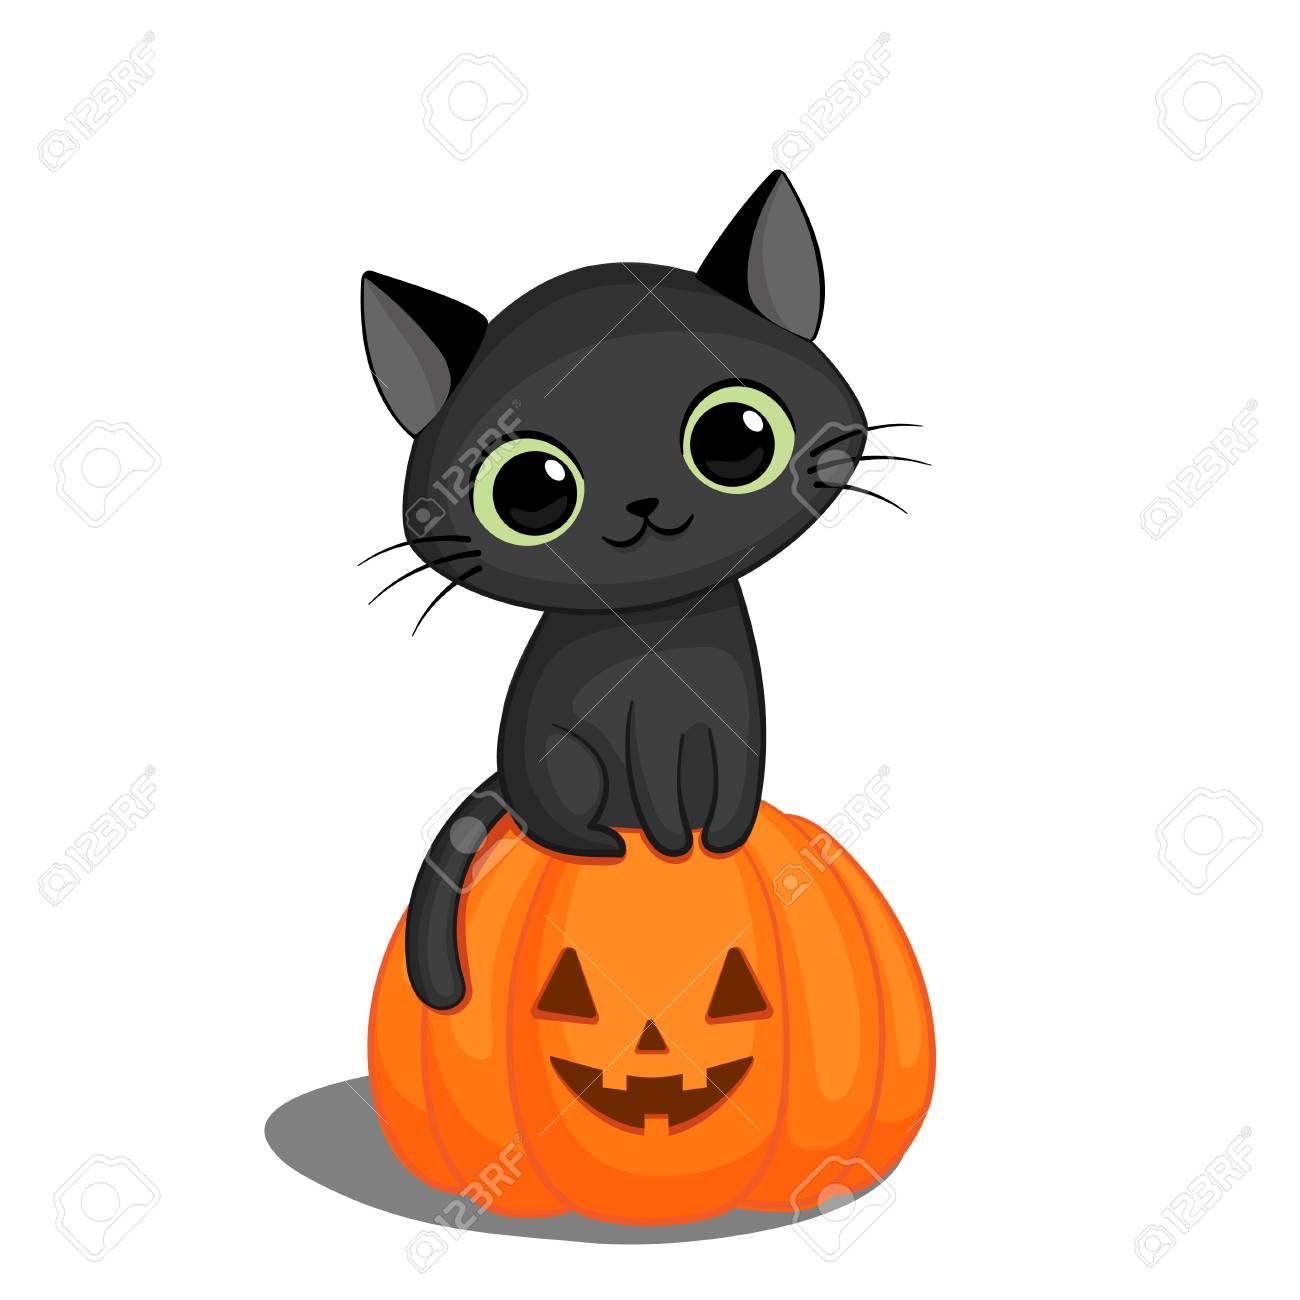 Cute Black Cat In Sitting On A Halloween Pumpkin